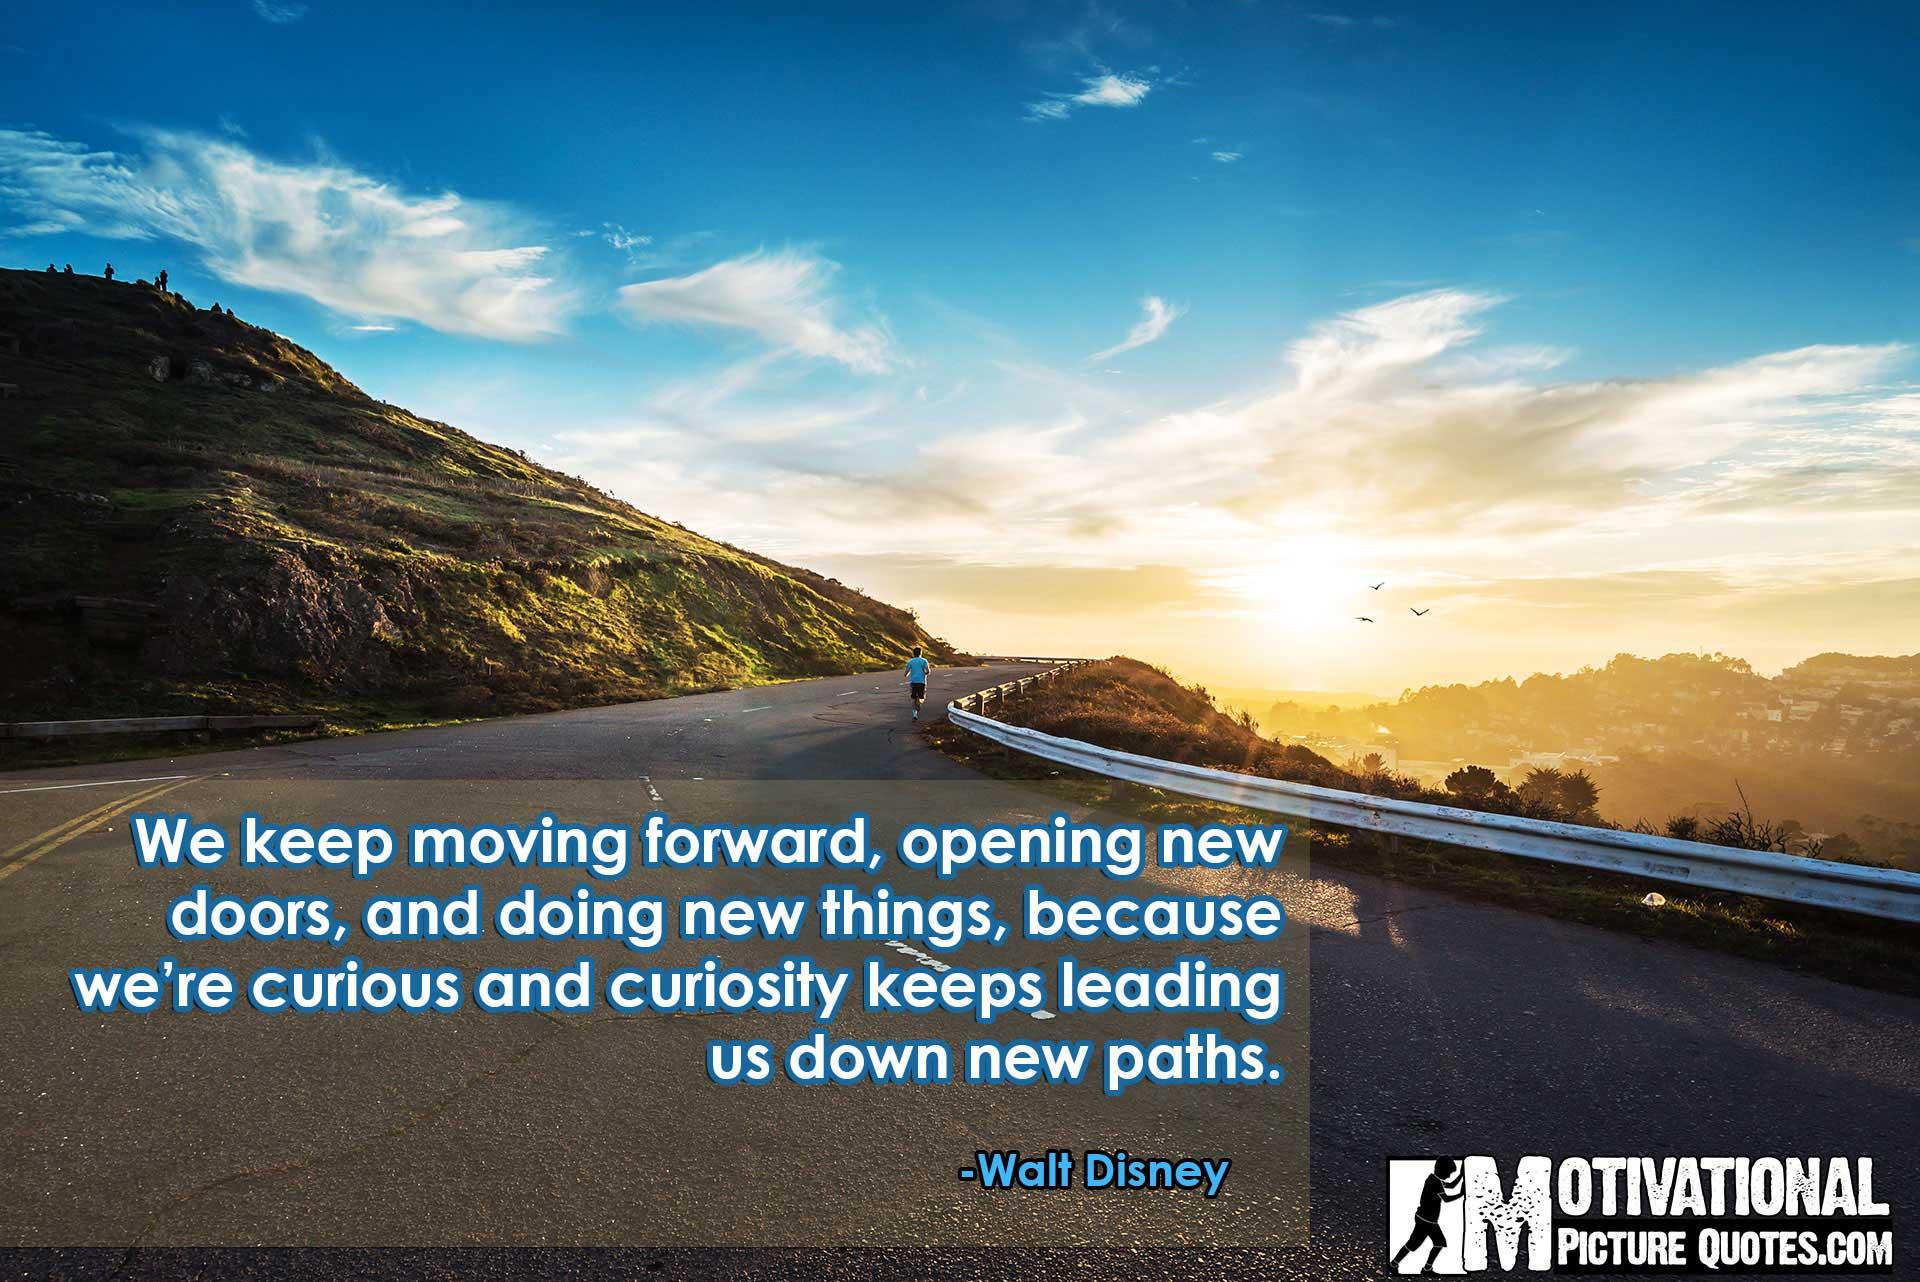 Quotes walt disney keep moving forward